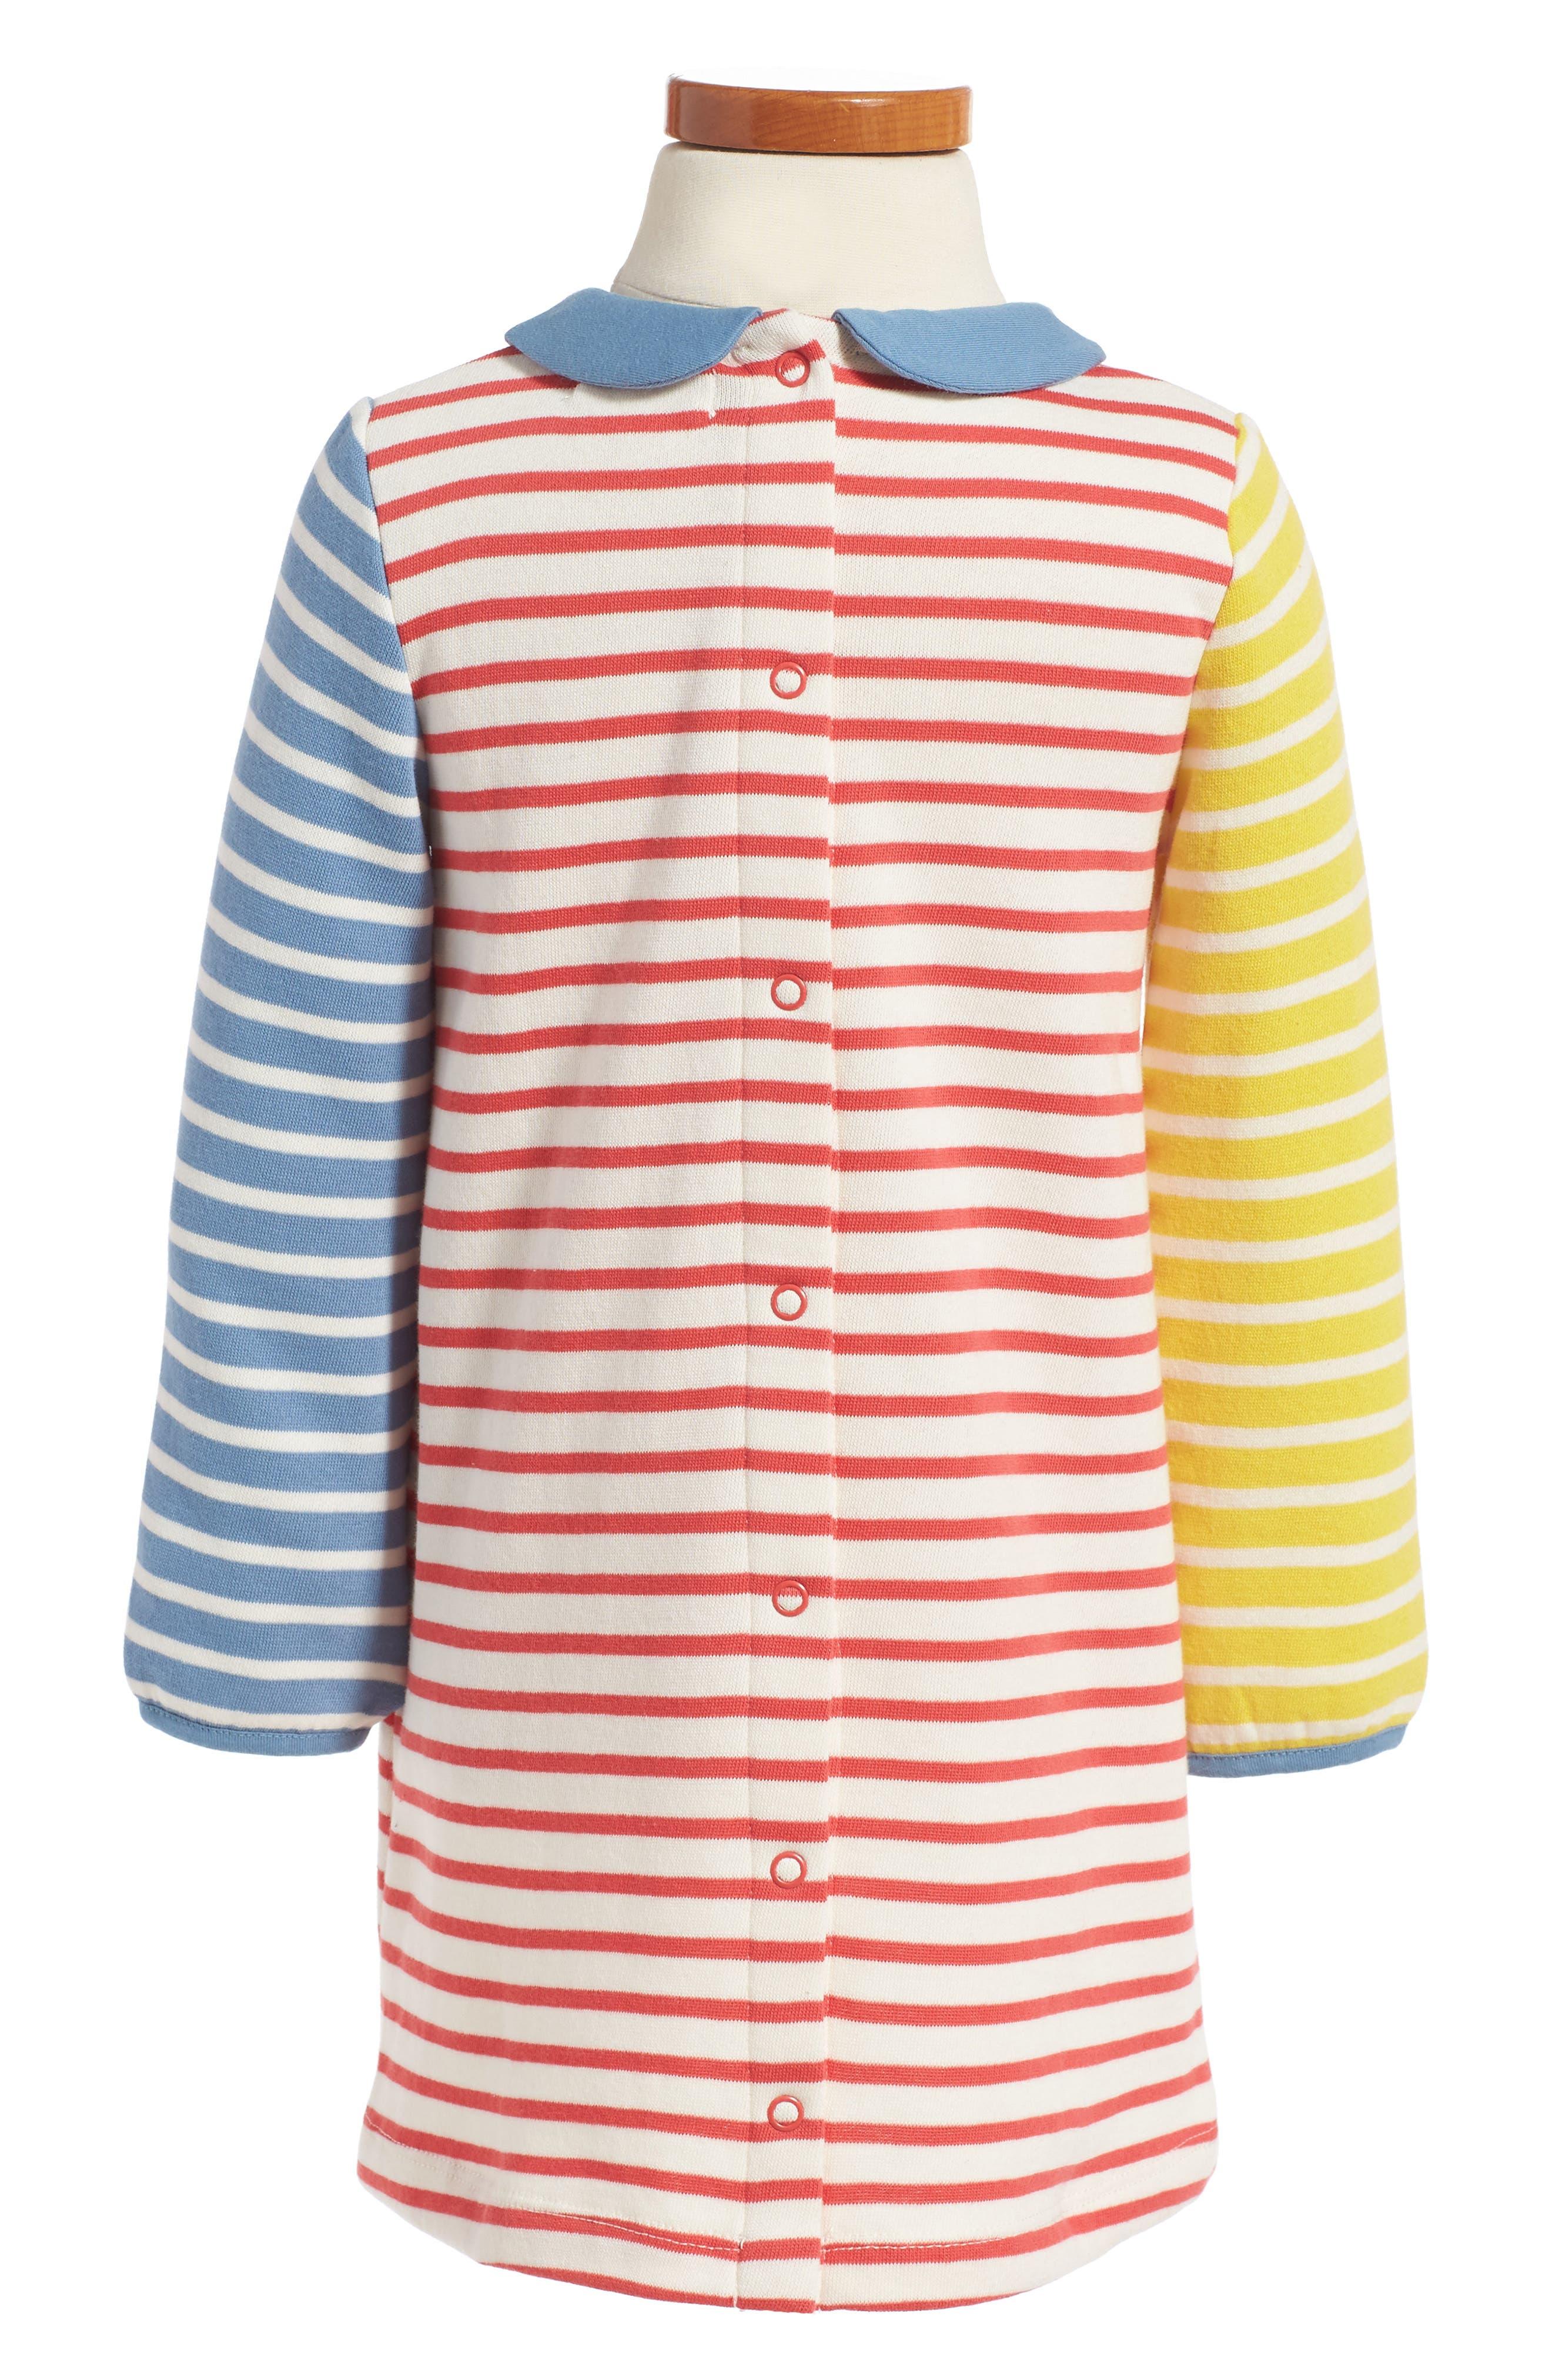 Alternate Image 2  - Mini Boden Cosy Peter Pan Collar Sweatshirt Dress (Baby Girls & Toddler Girls)